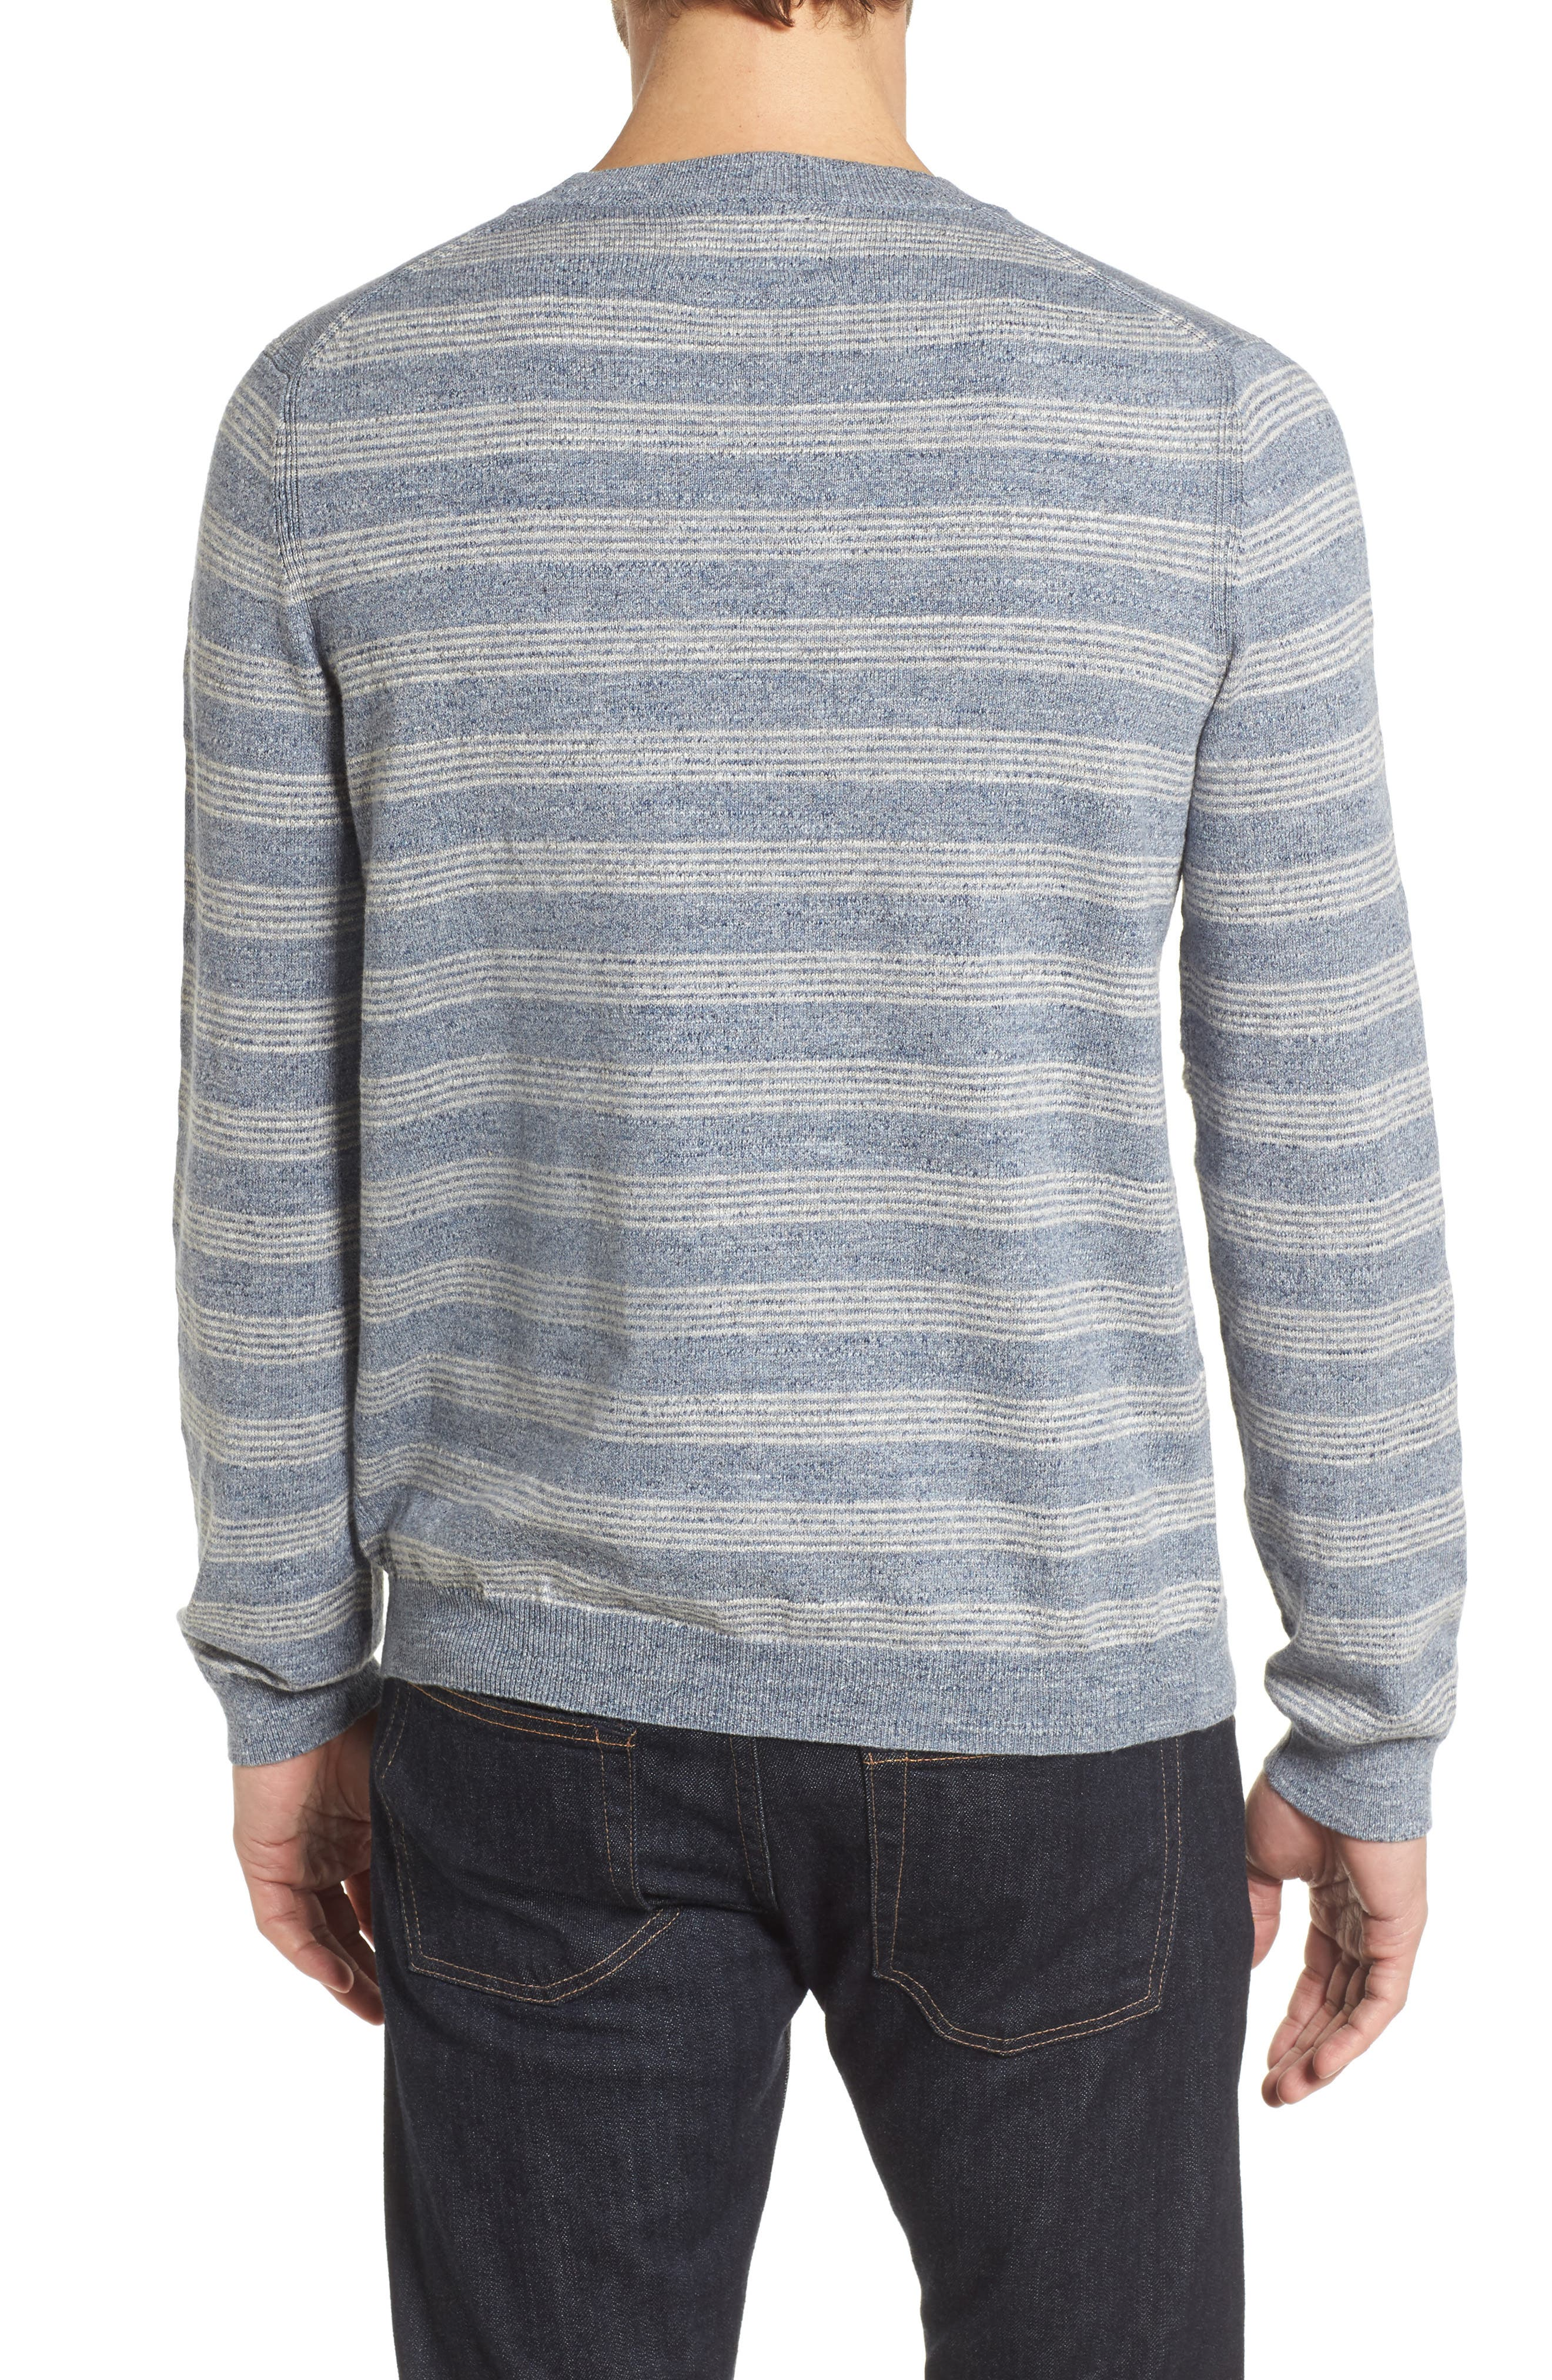 Stripe Cotton Sweater,                             Alternate thumbnail 2, color,                             Blue Grey Heather Stripe